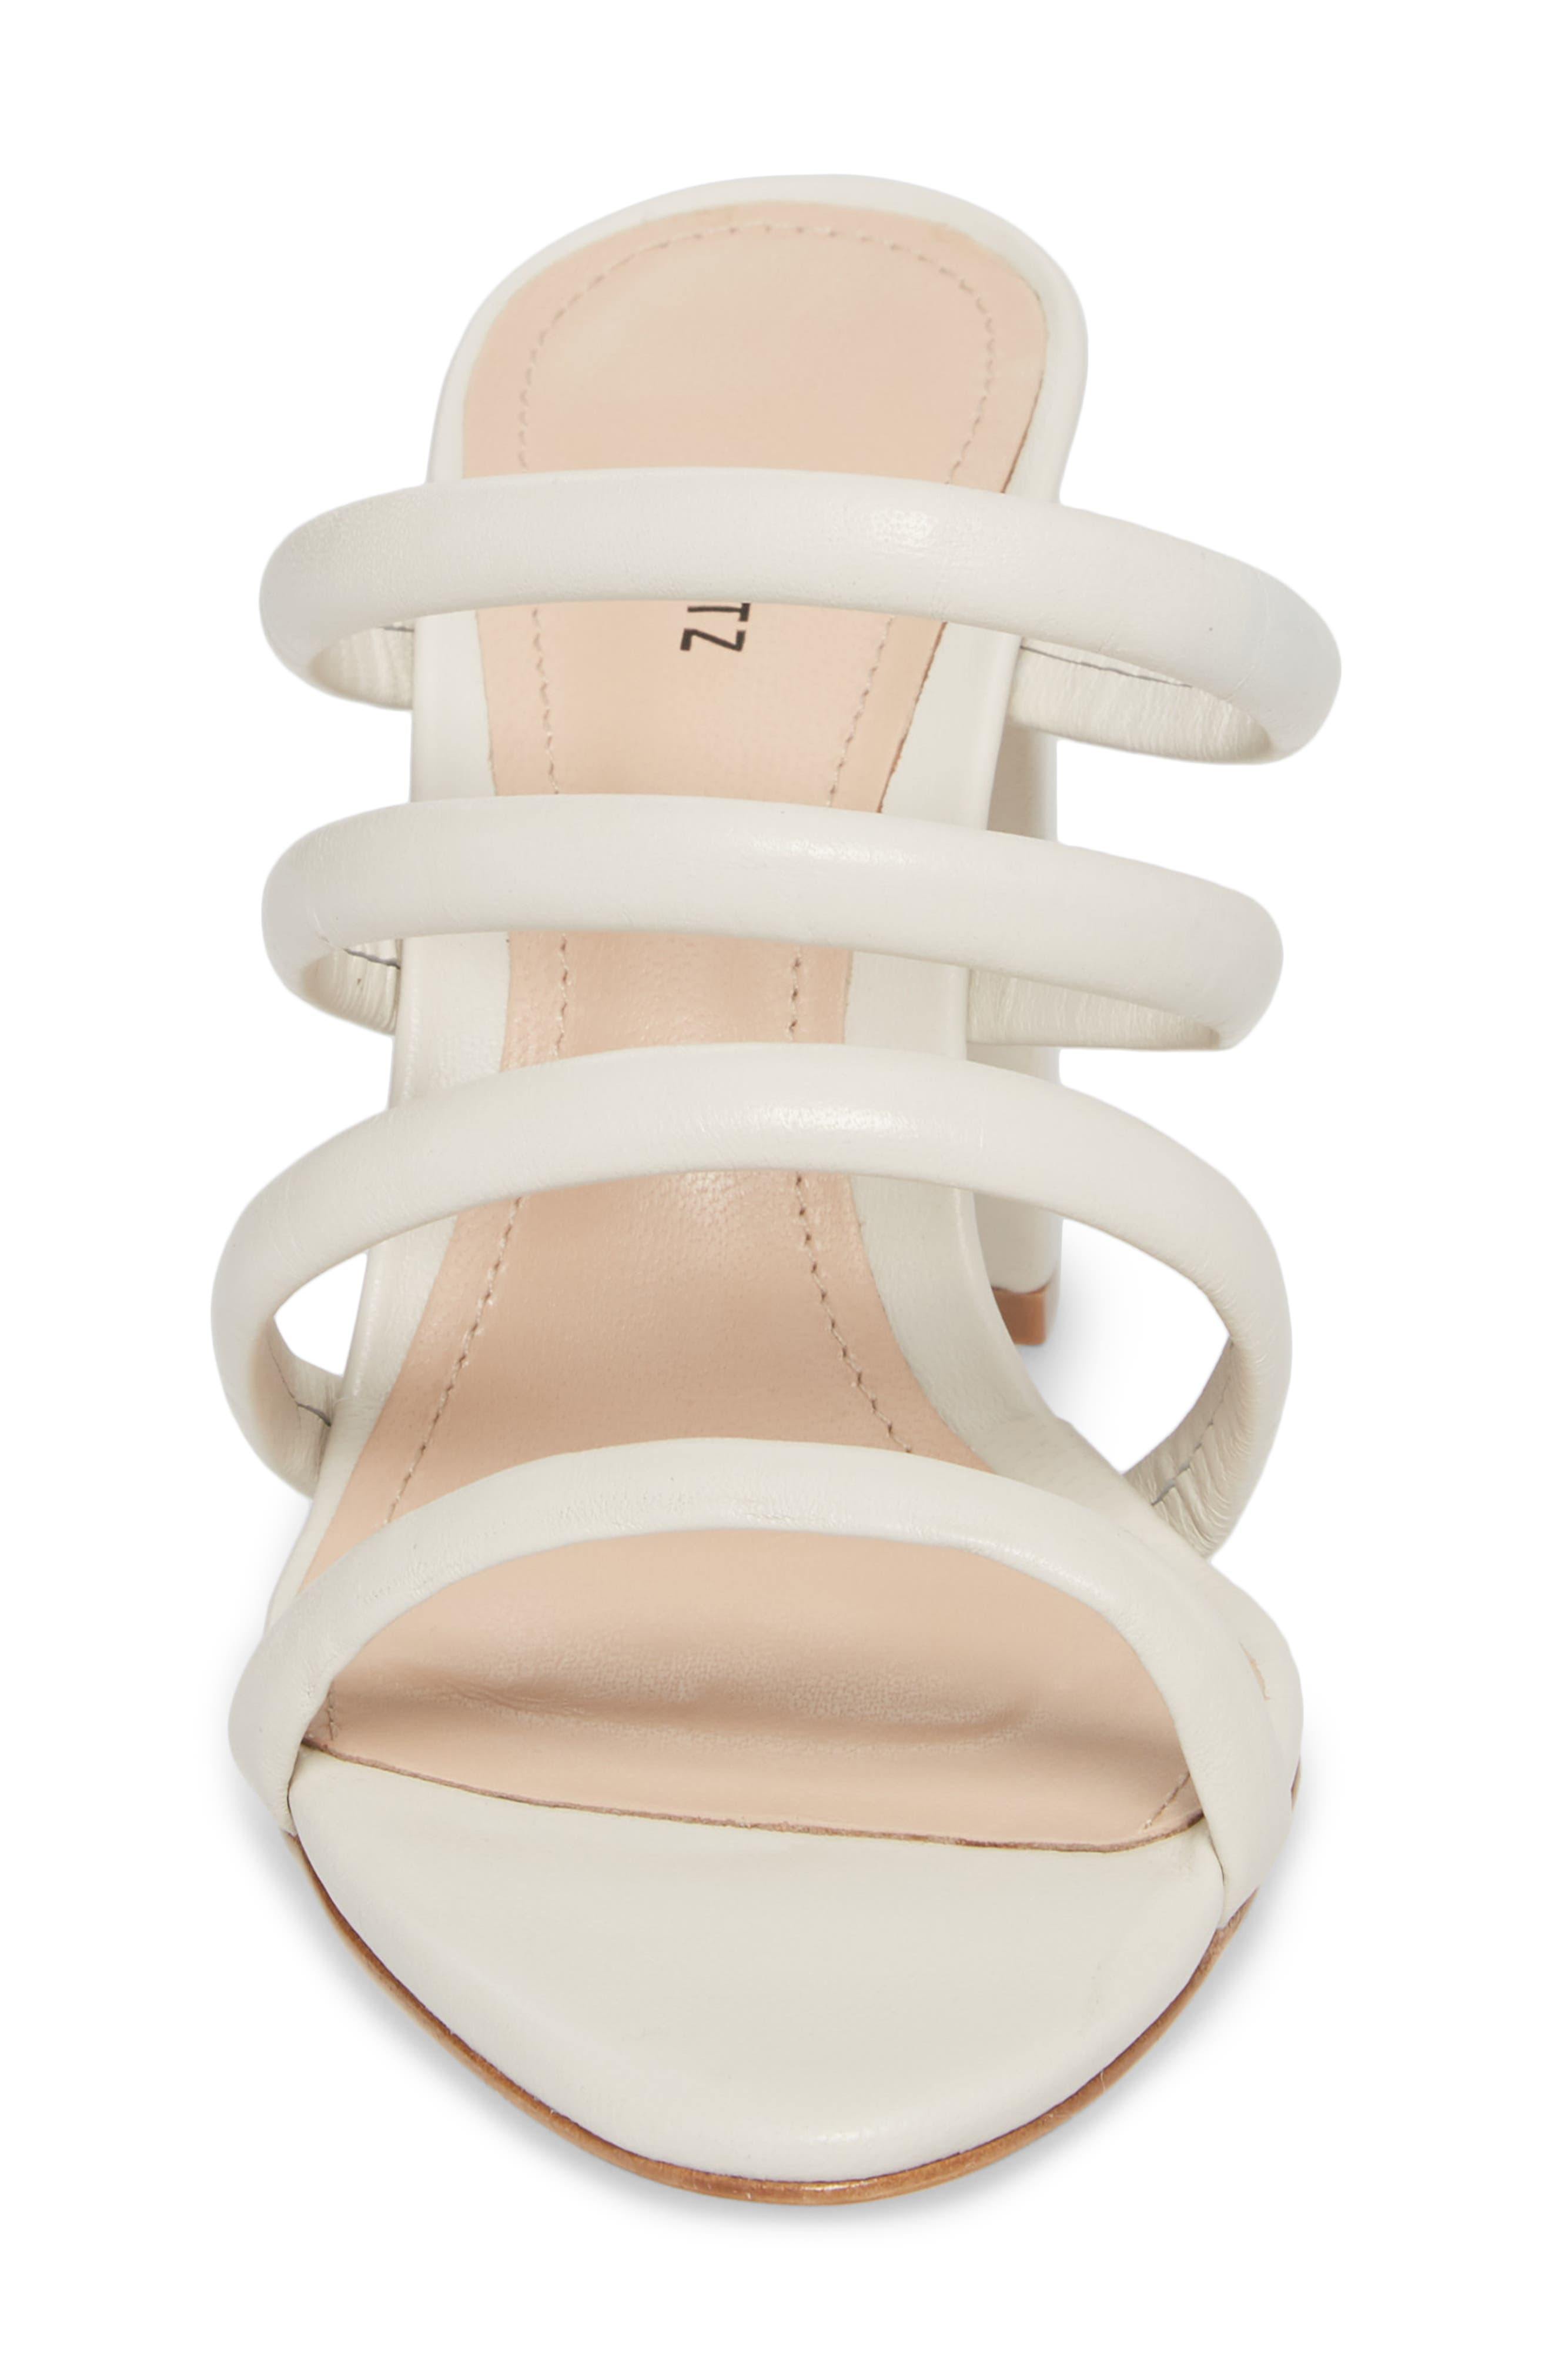 Felisa Block Heel Sandal,                             Alternate thumbnail 4, color,                             Pearl Leather